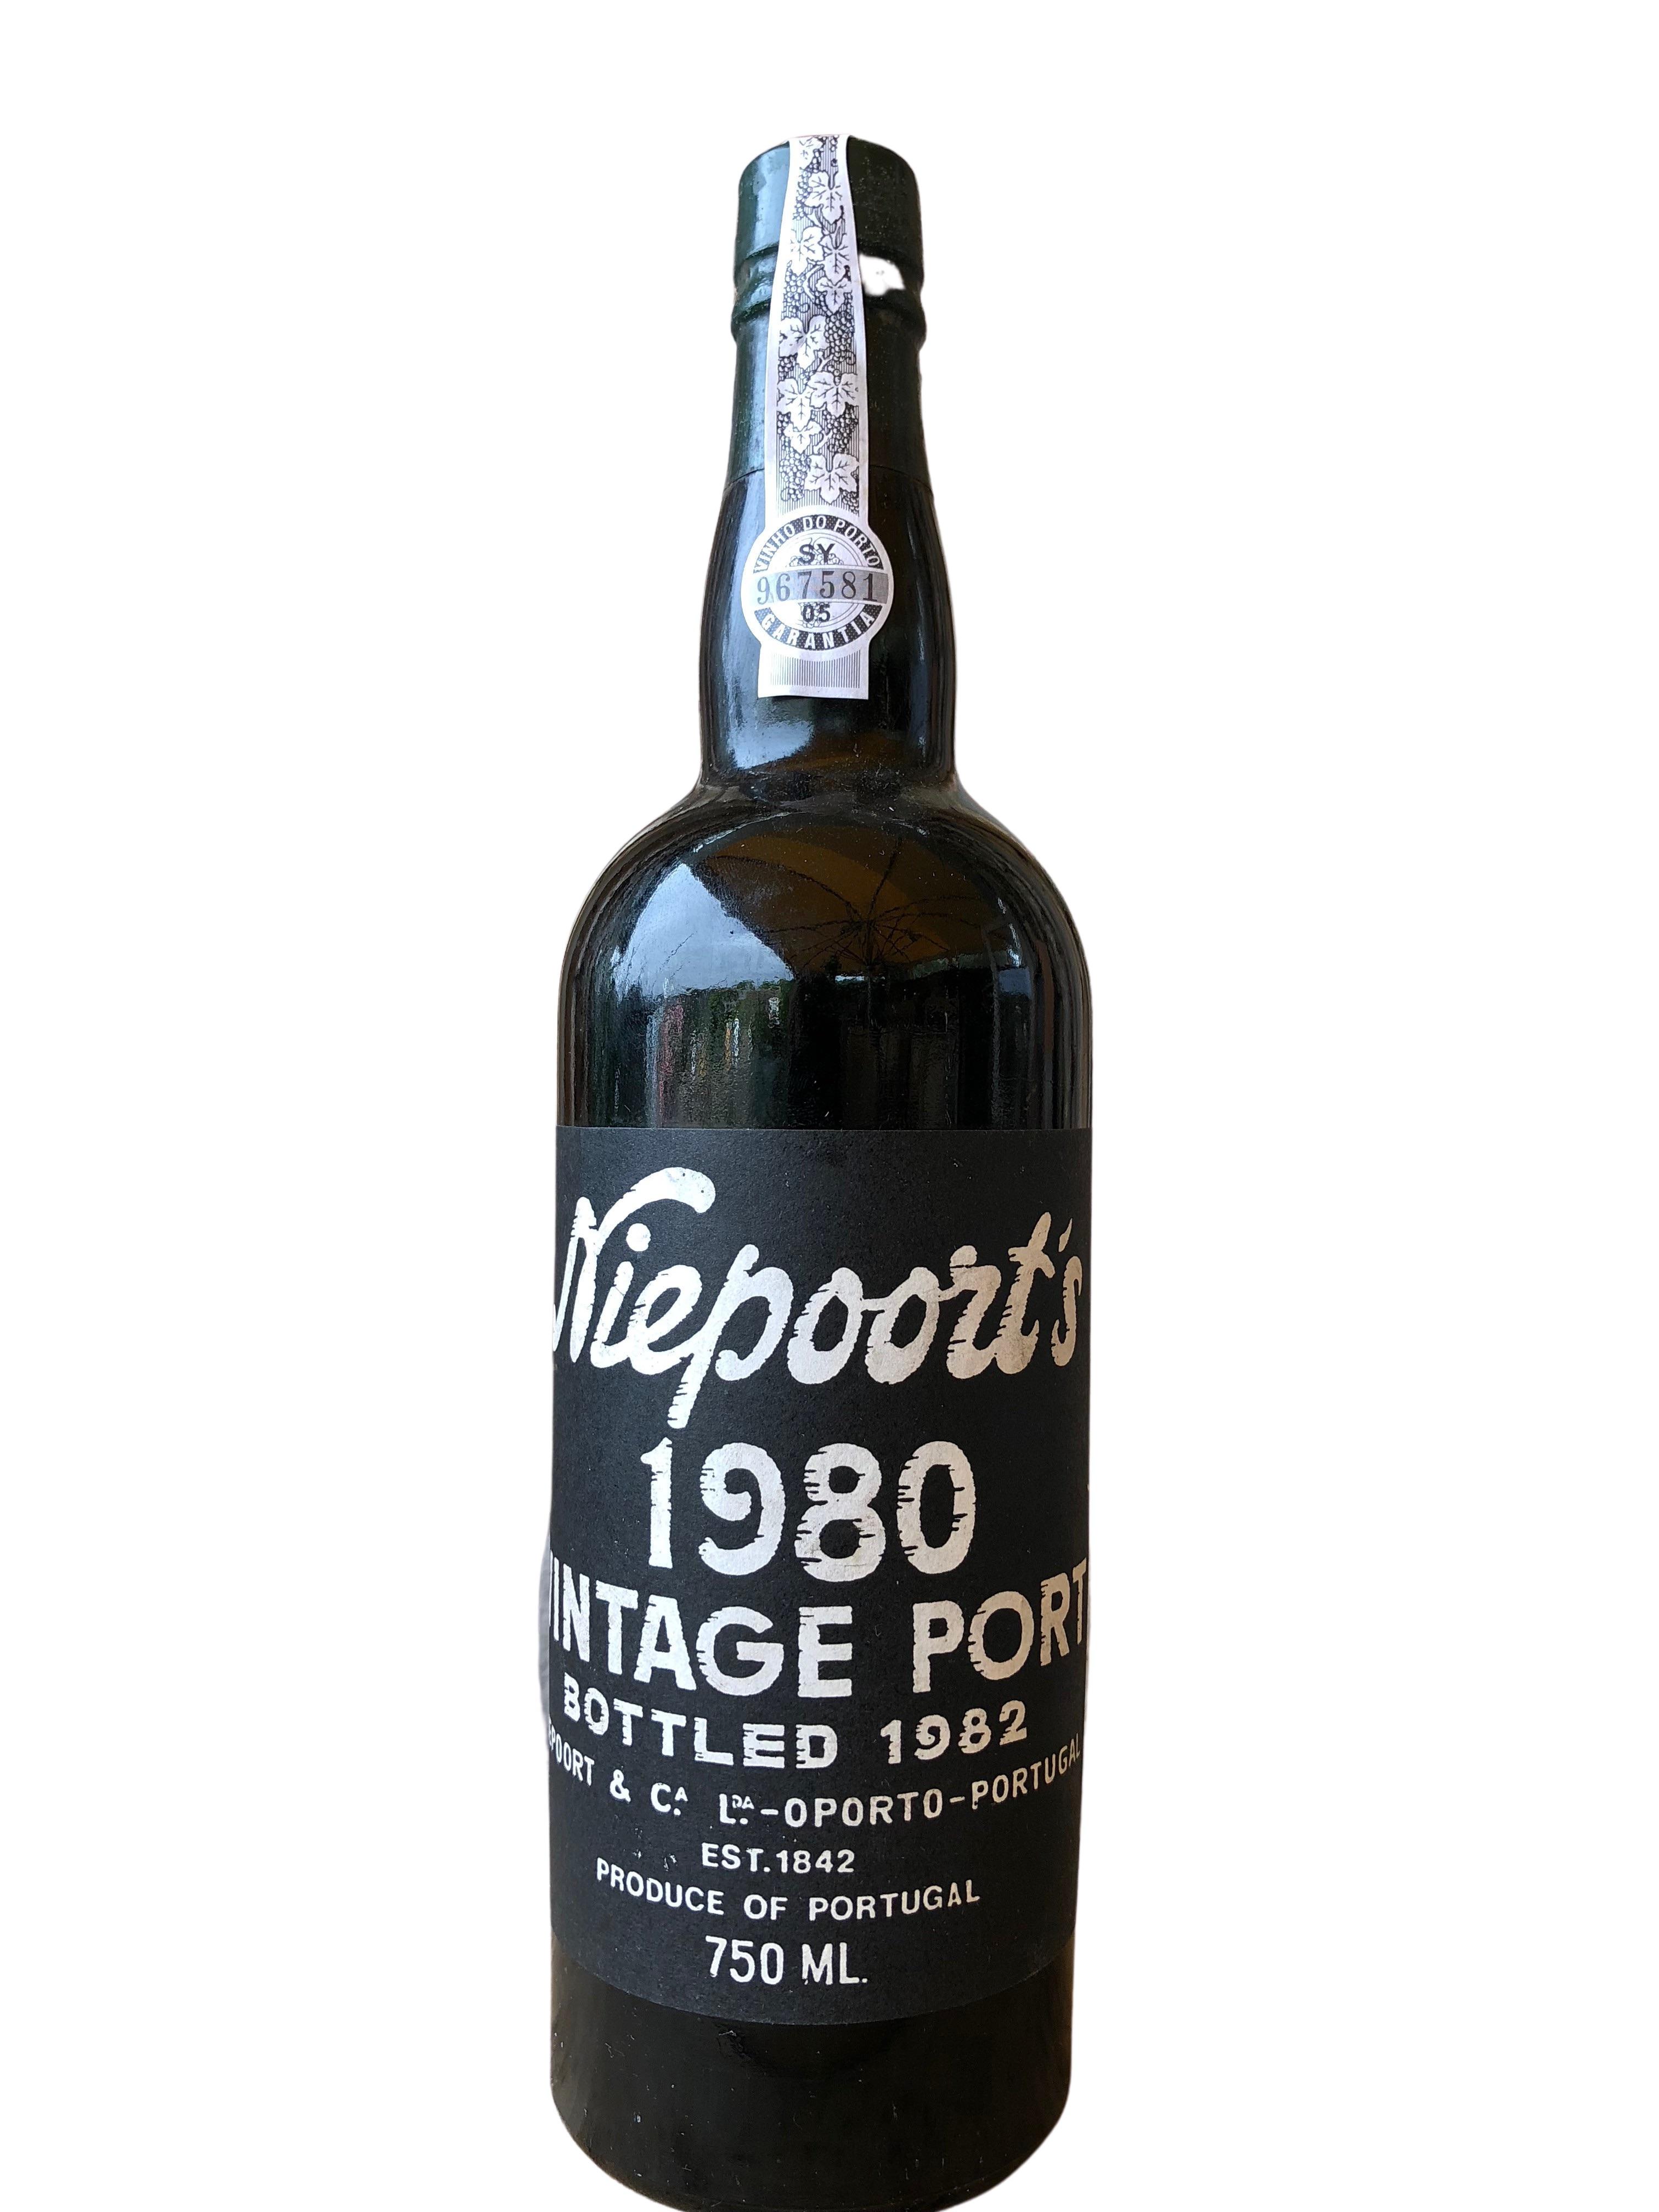 1980 Niepoort Vintage Port